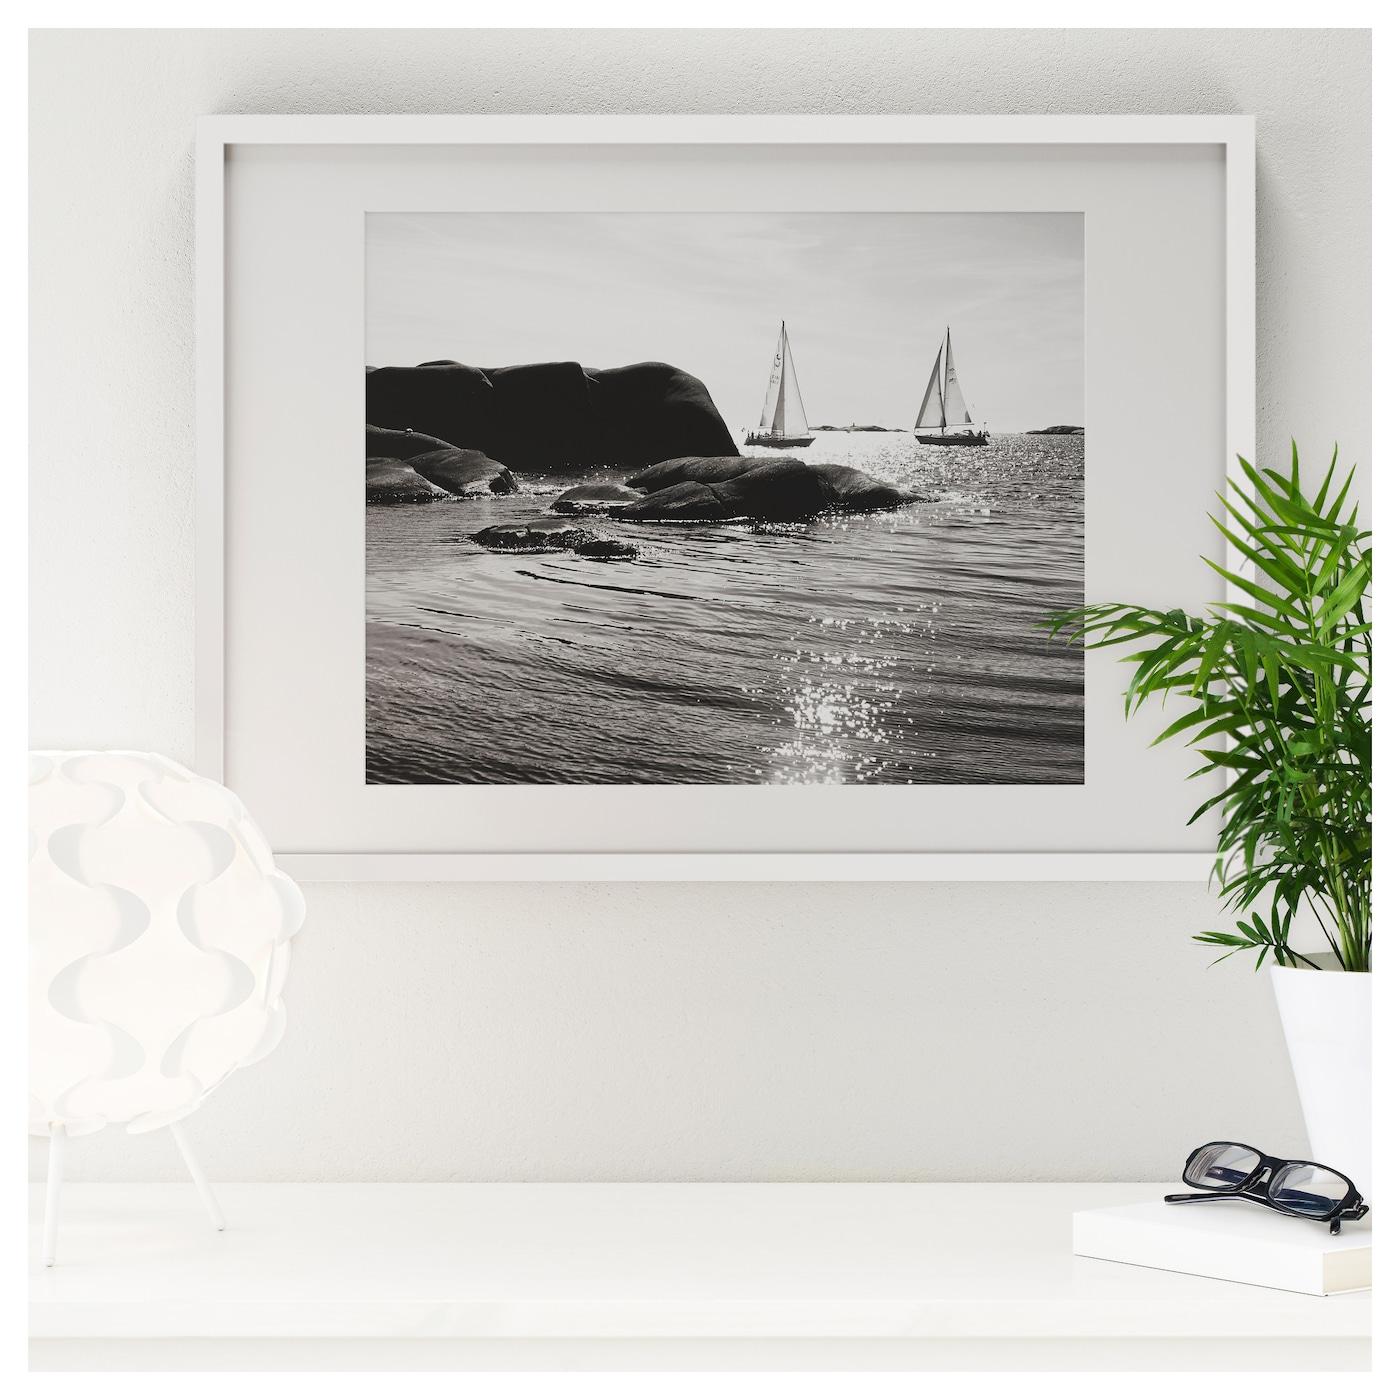 Ribba frame white 50 x 70 cm ikea for Cornice ribba ikea